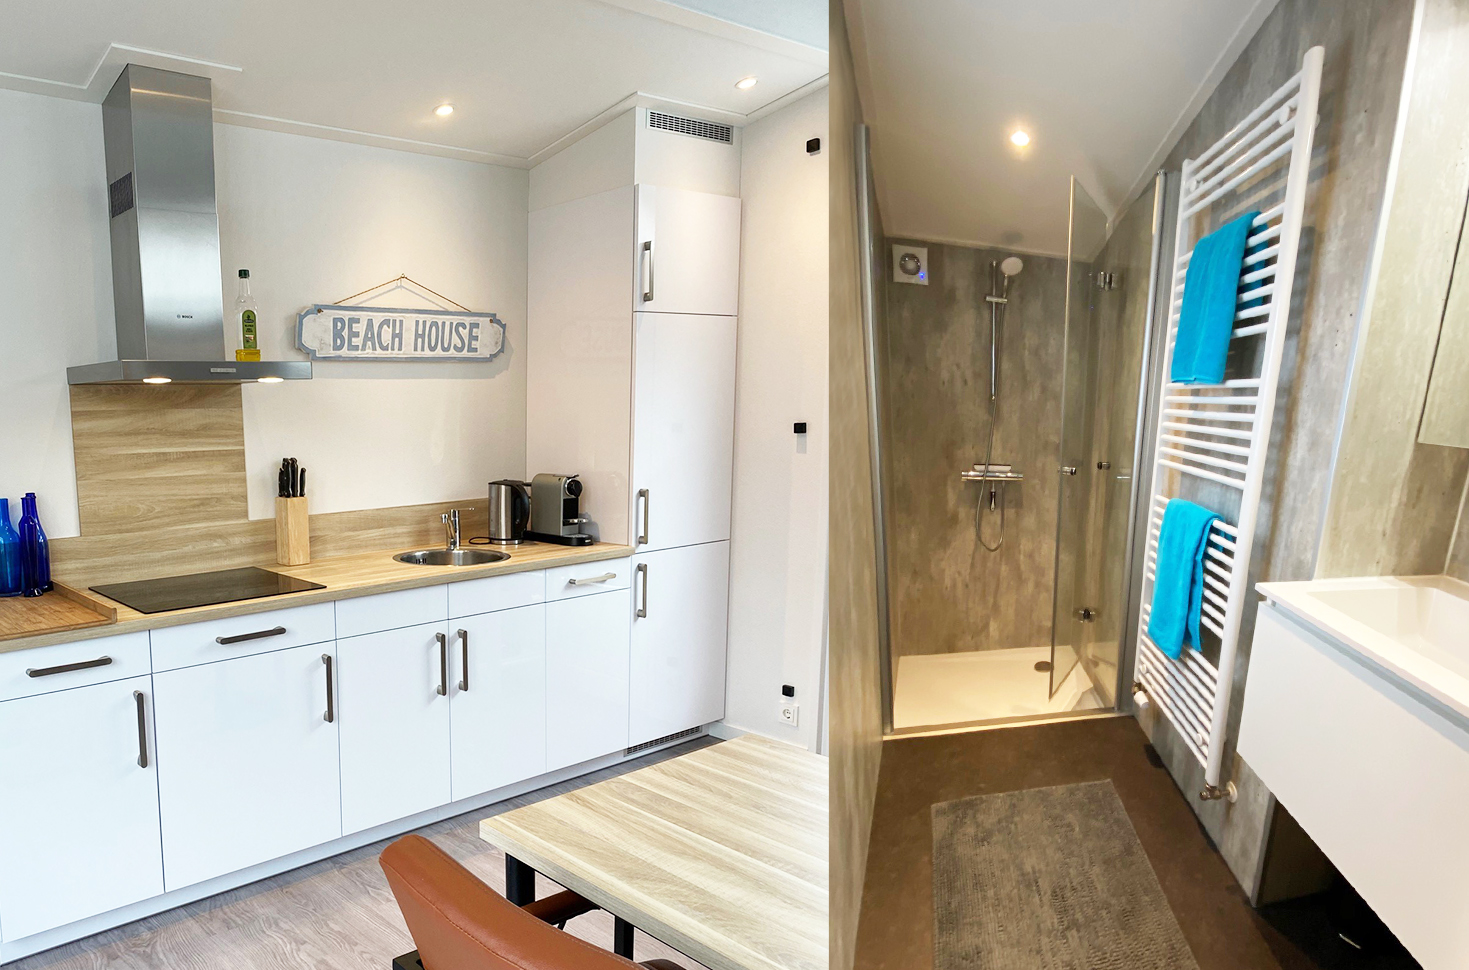 SterVakantiehuis_keuken_badkamer